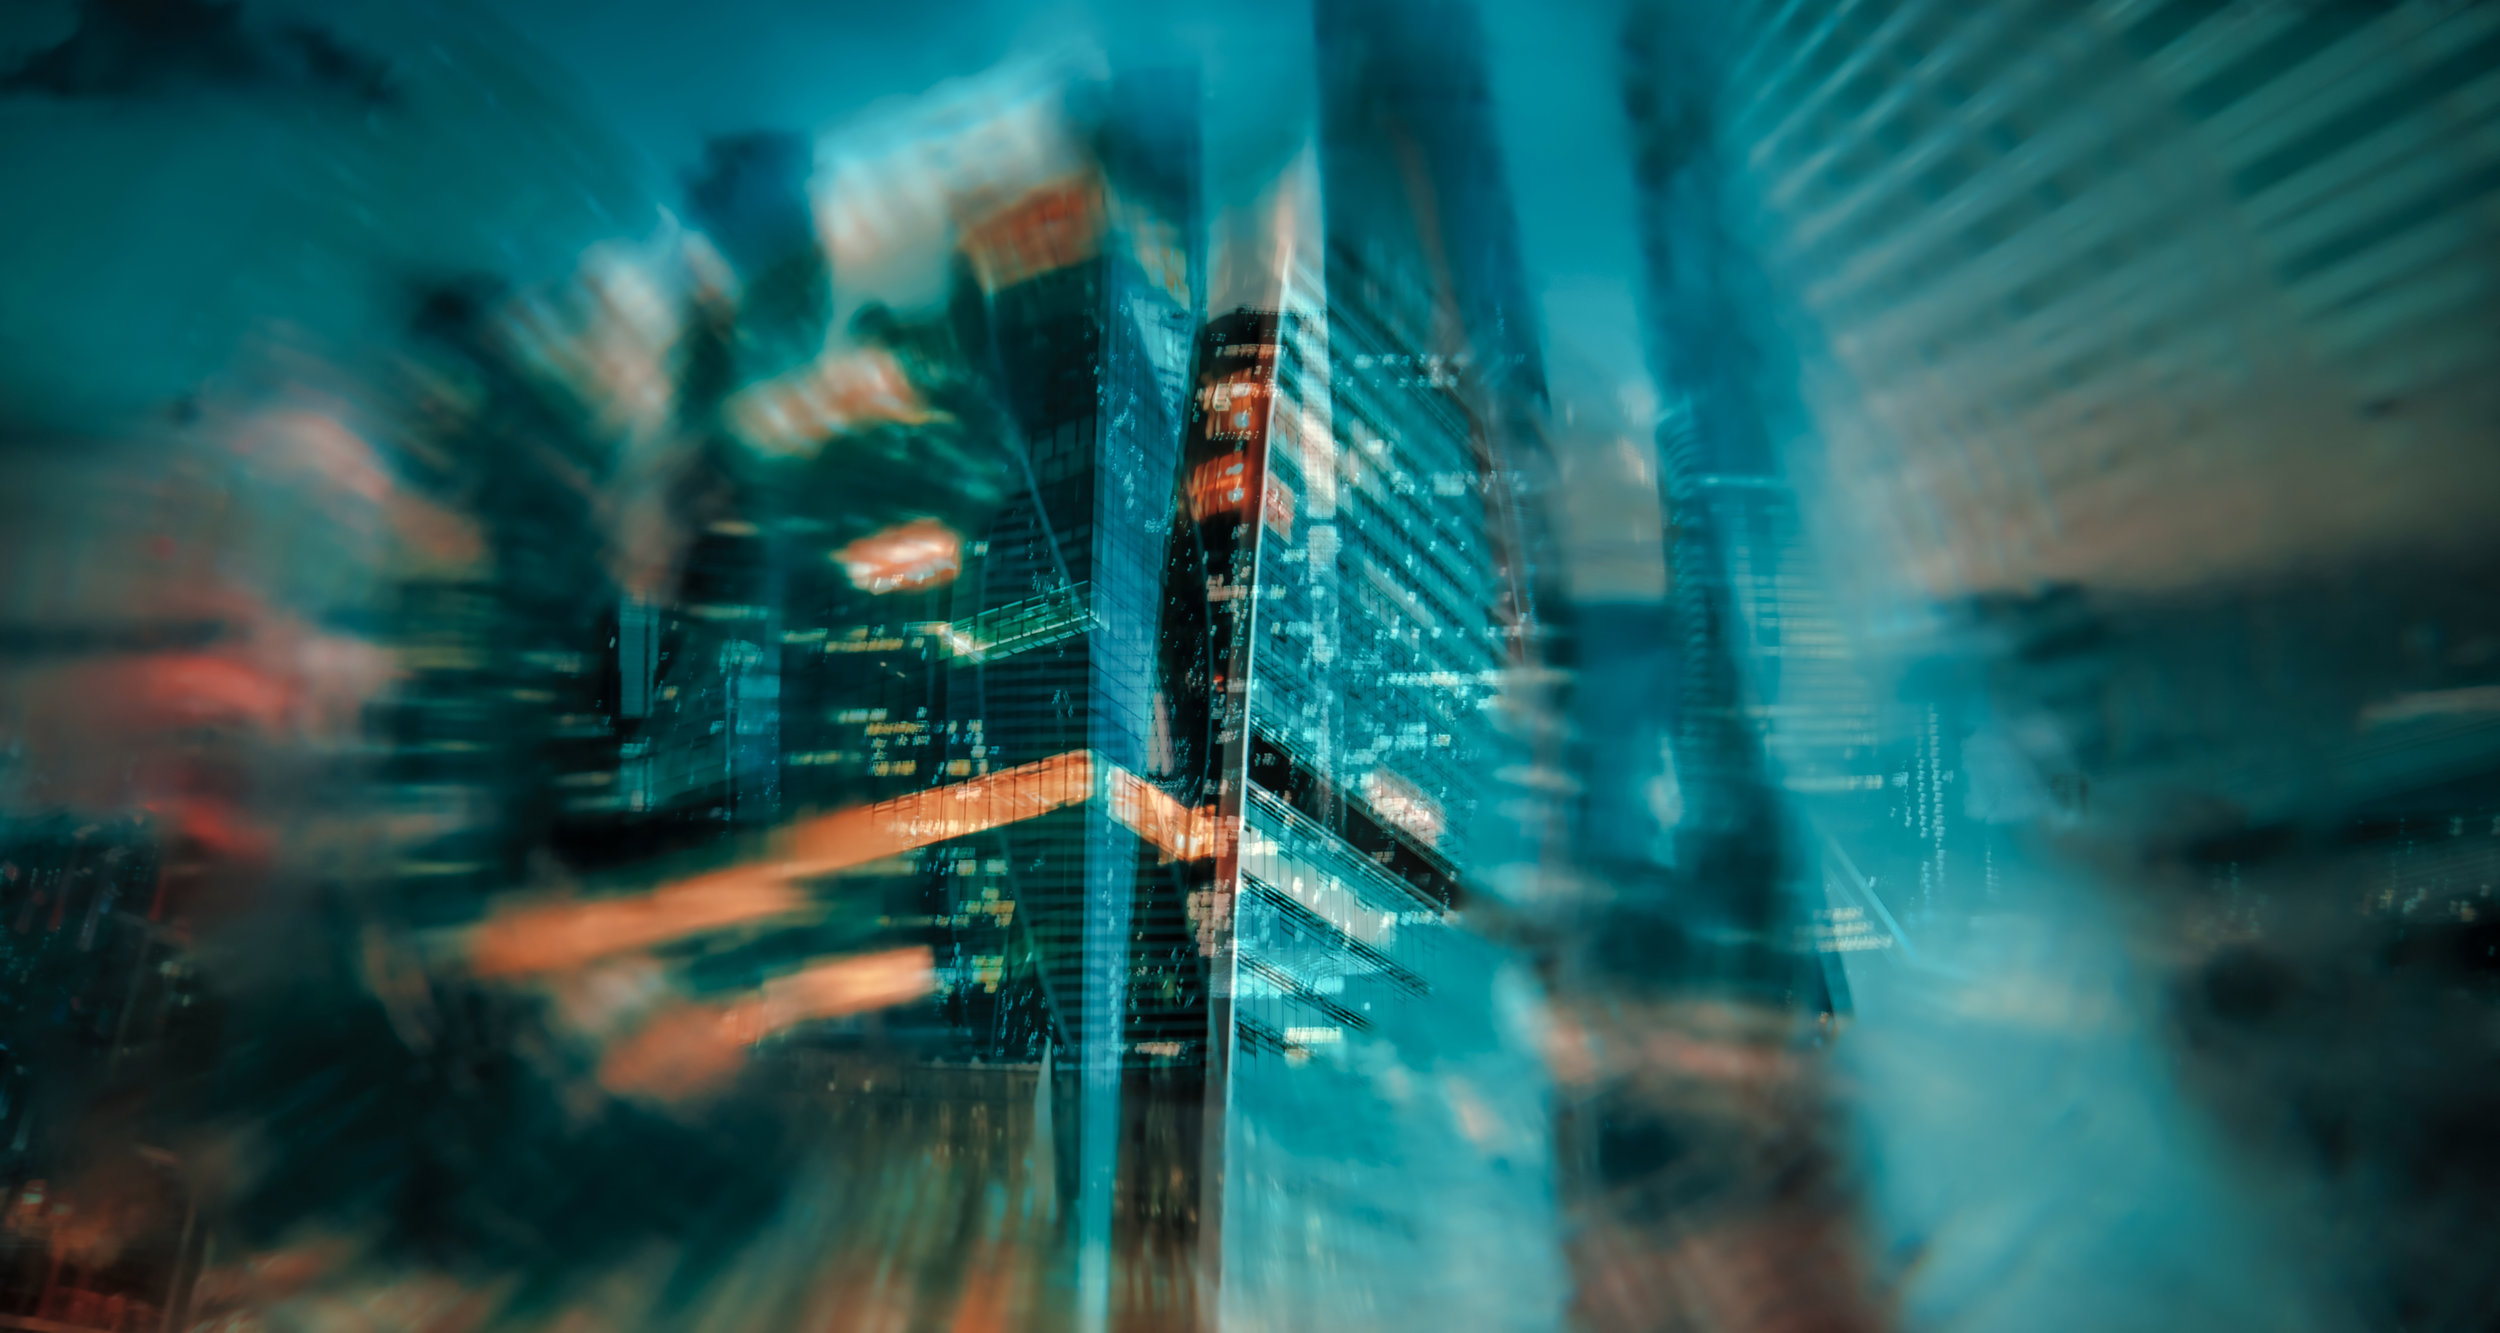 action-blur-city-590701.jpg